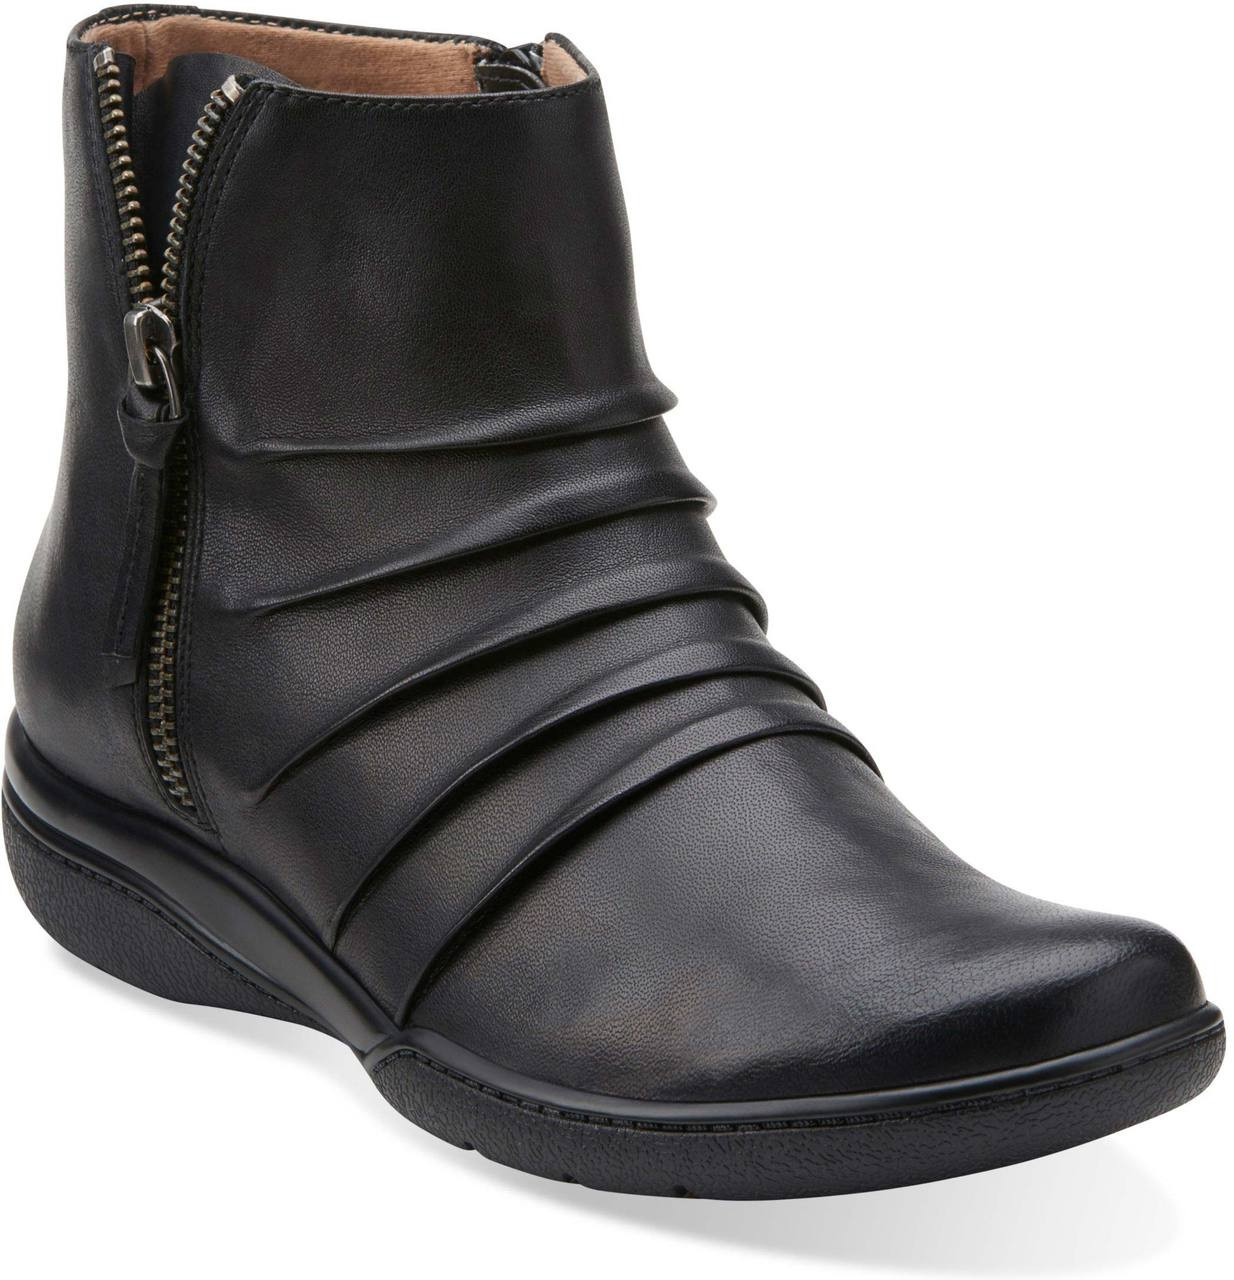 ... Boots; Clarks Women's Kearns Blush. Black Leather